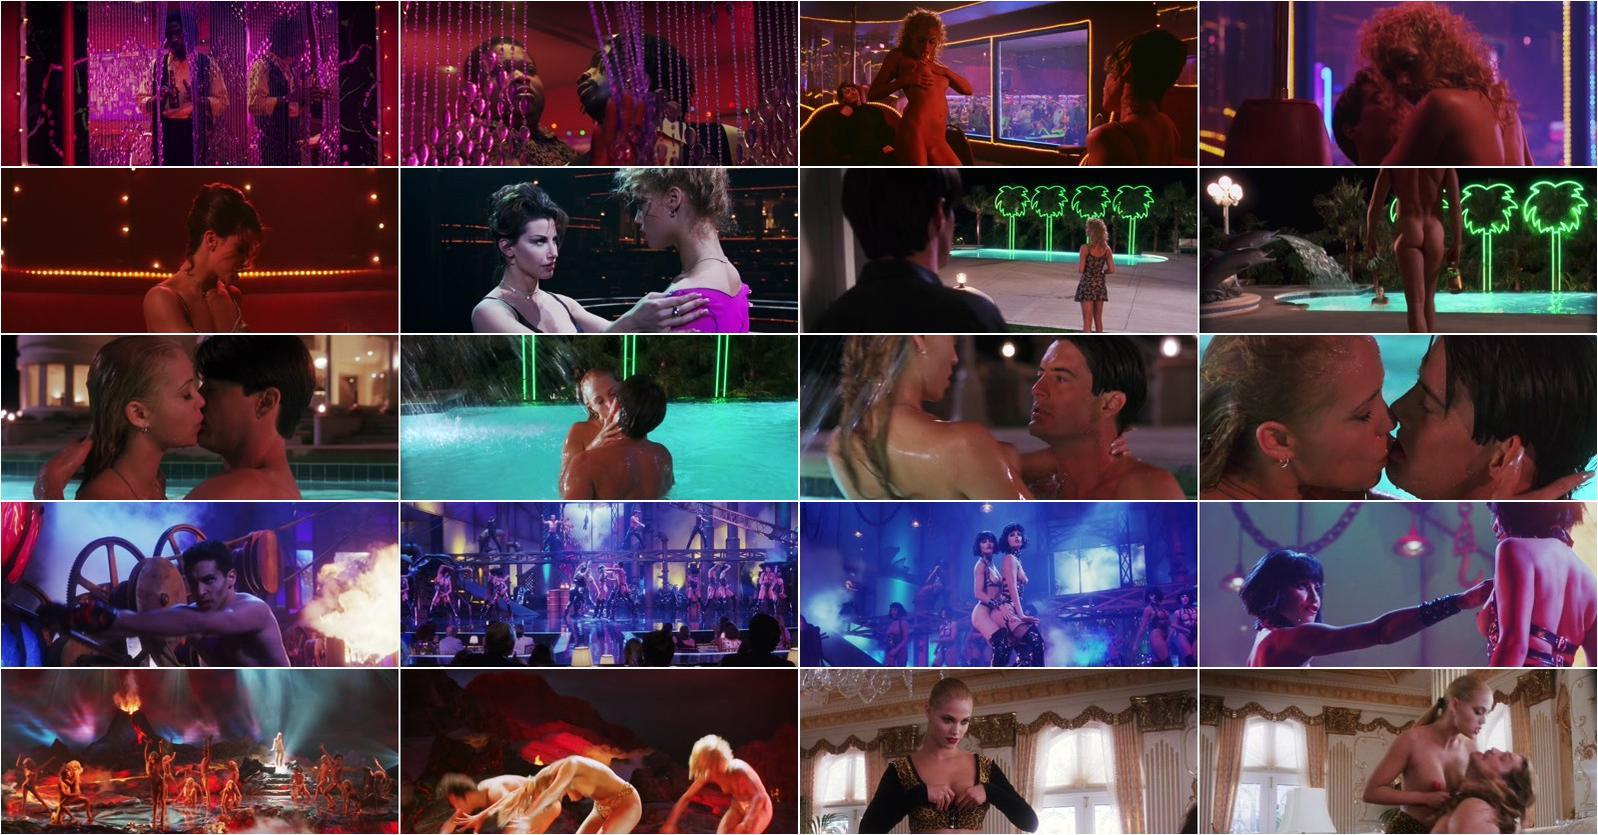 Gif sex showgirls sex scene video mature ametuer handjob